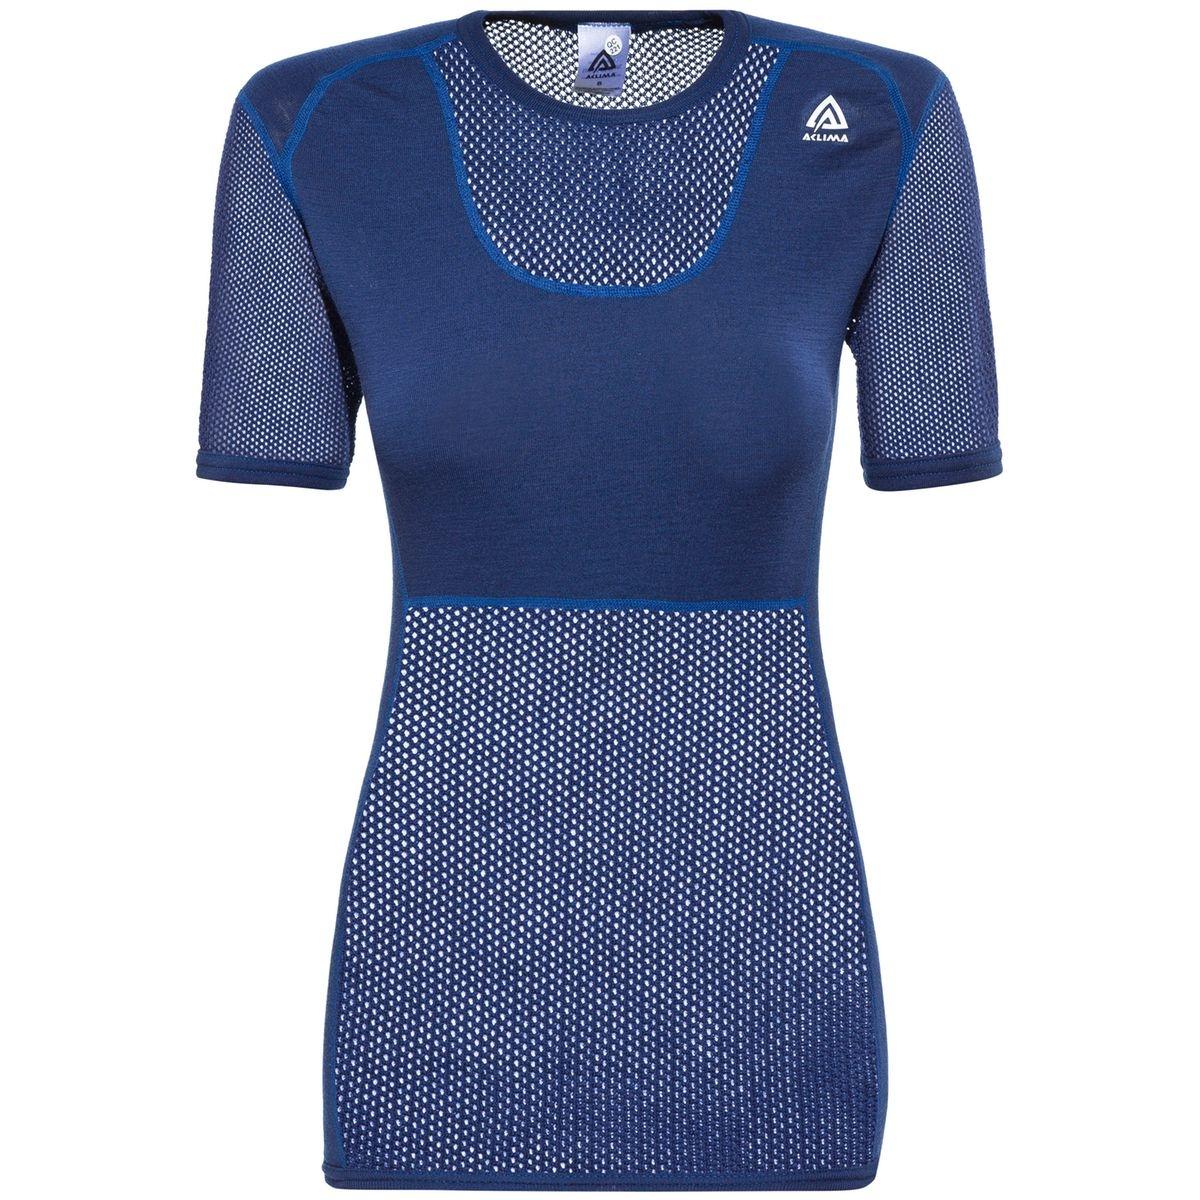 Coolnet - Sous-vêtement Femme - bleu